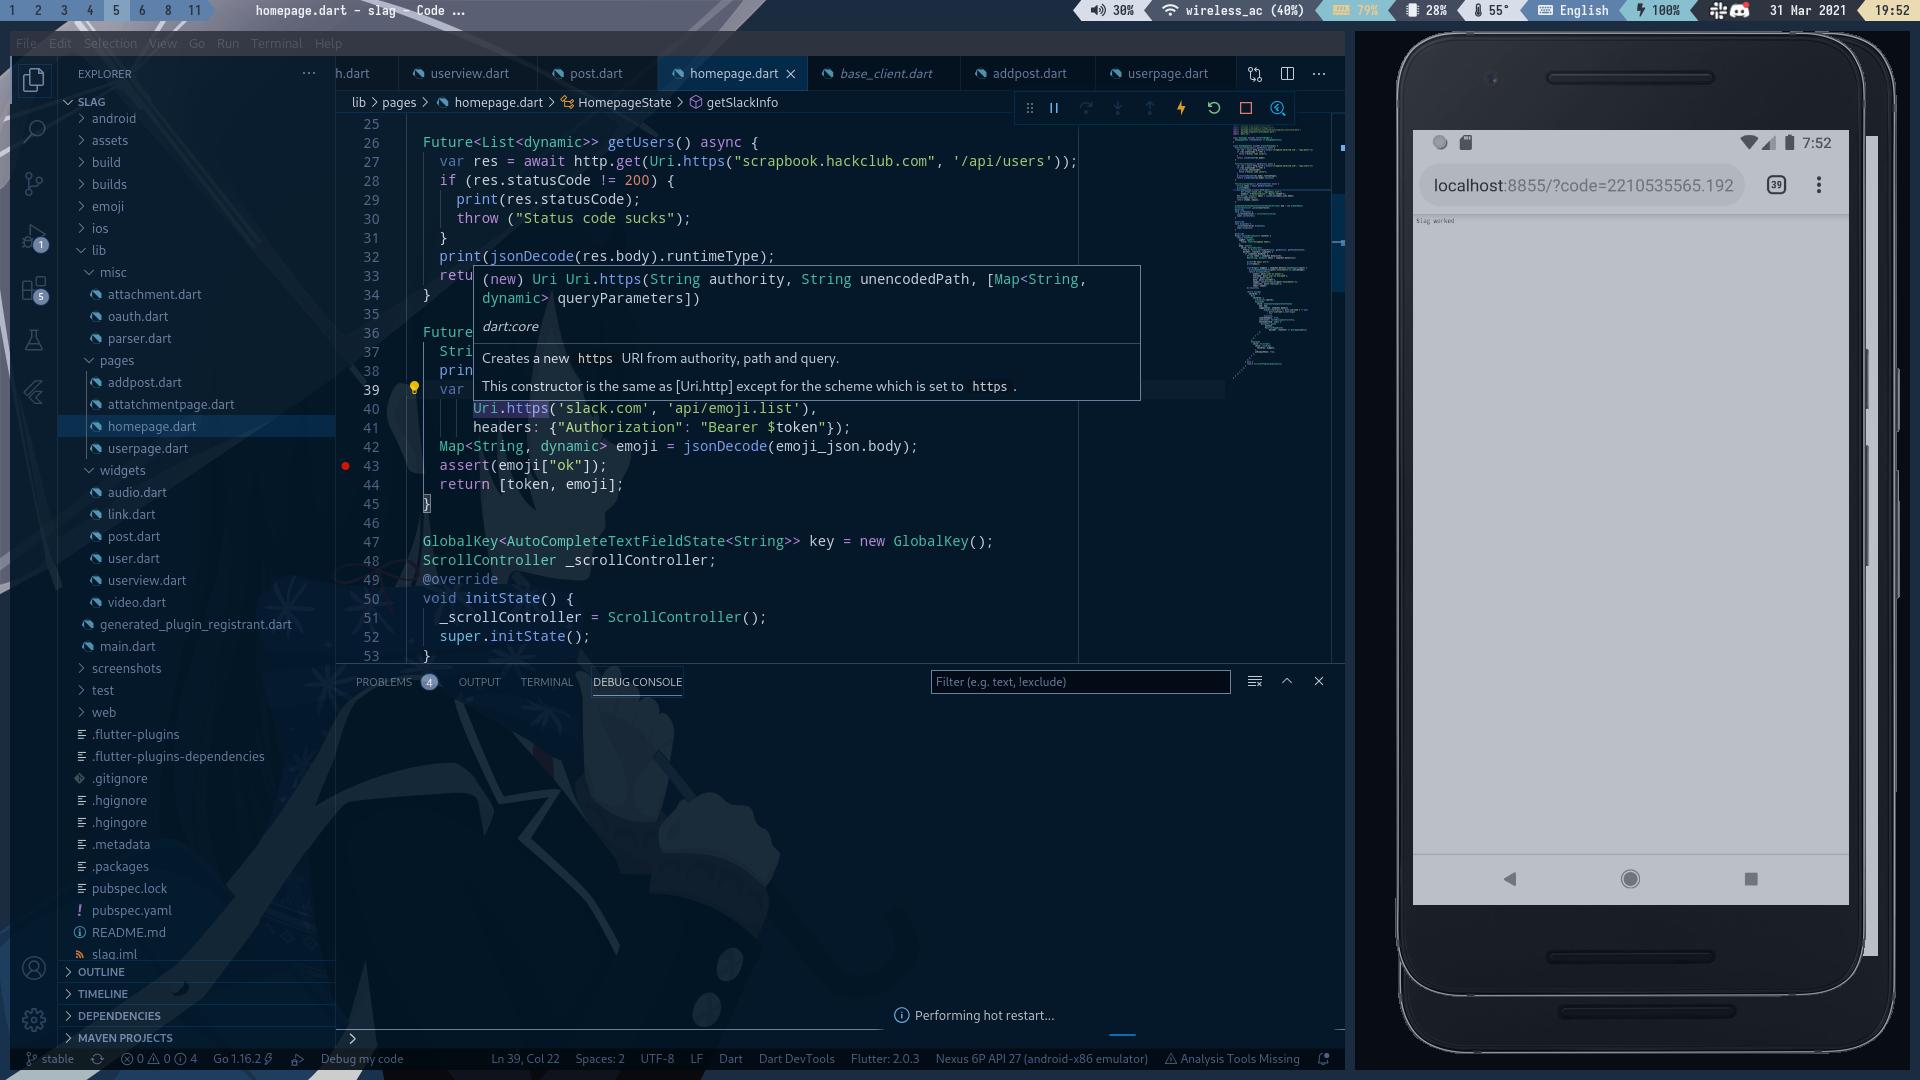 https://cloud-gpvg23c1r-hack-club-bot.vercel.app/0image.png